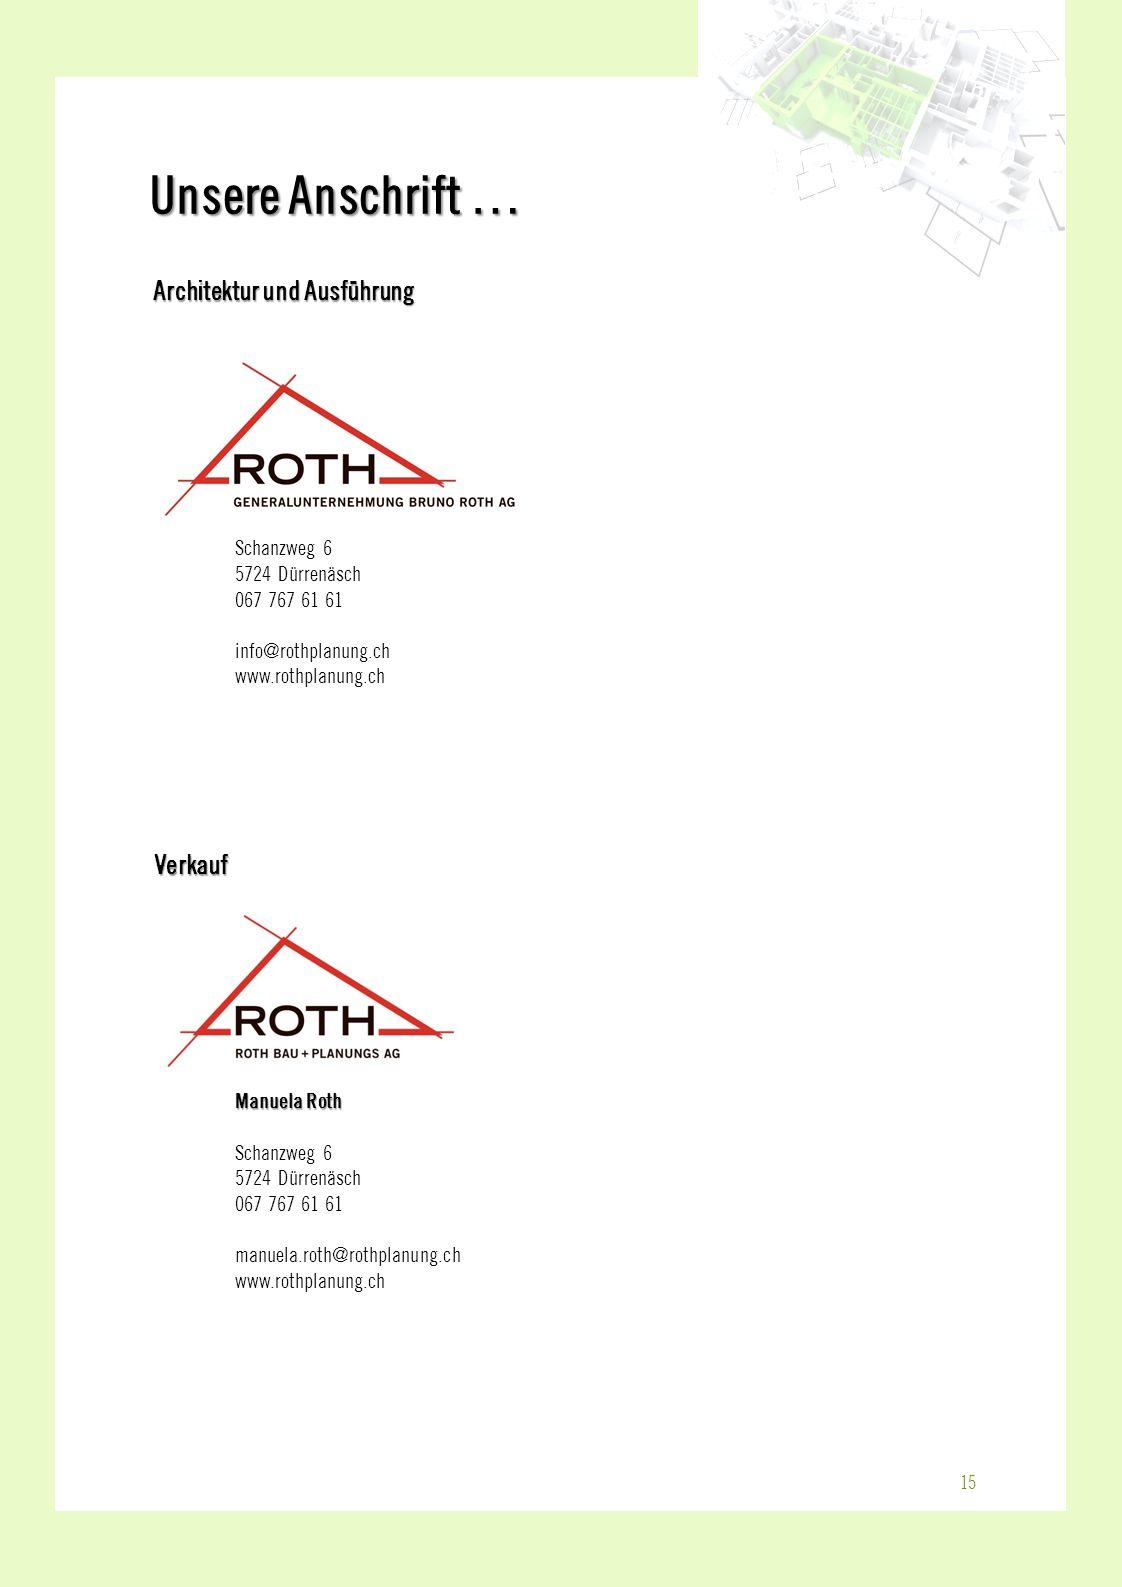 Verkauf Architektur und Ausführung Schanzweg 6 5724 Dürrenäsch 067 767 61 61 info@rothplanung.ch www.rothplanung.ch Manuela Roth Schanzweg 6 5724 Dürr